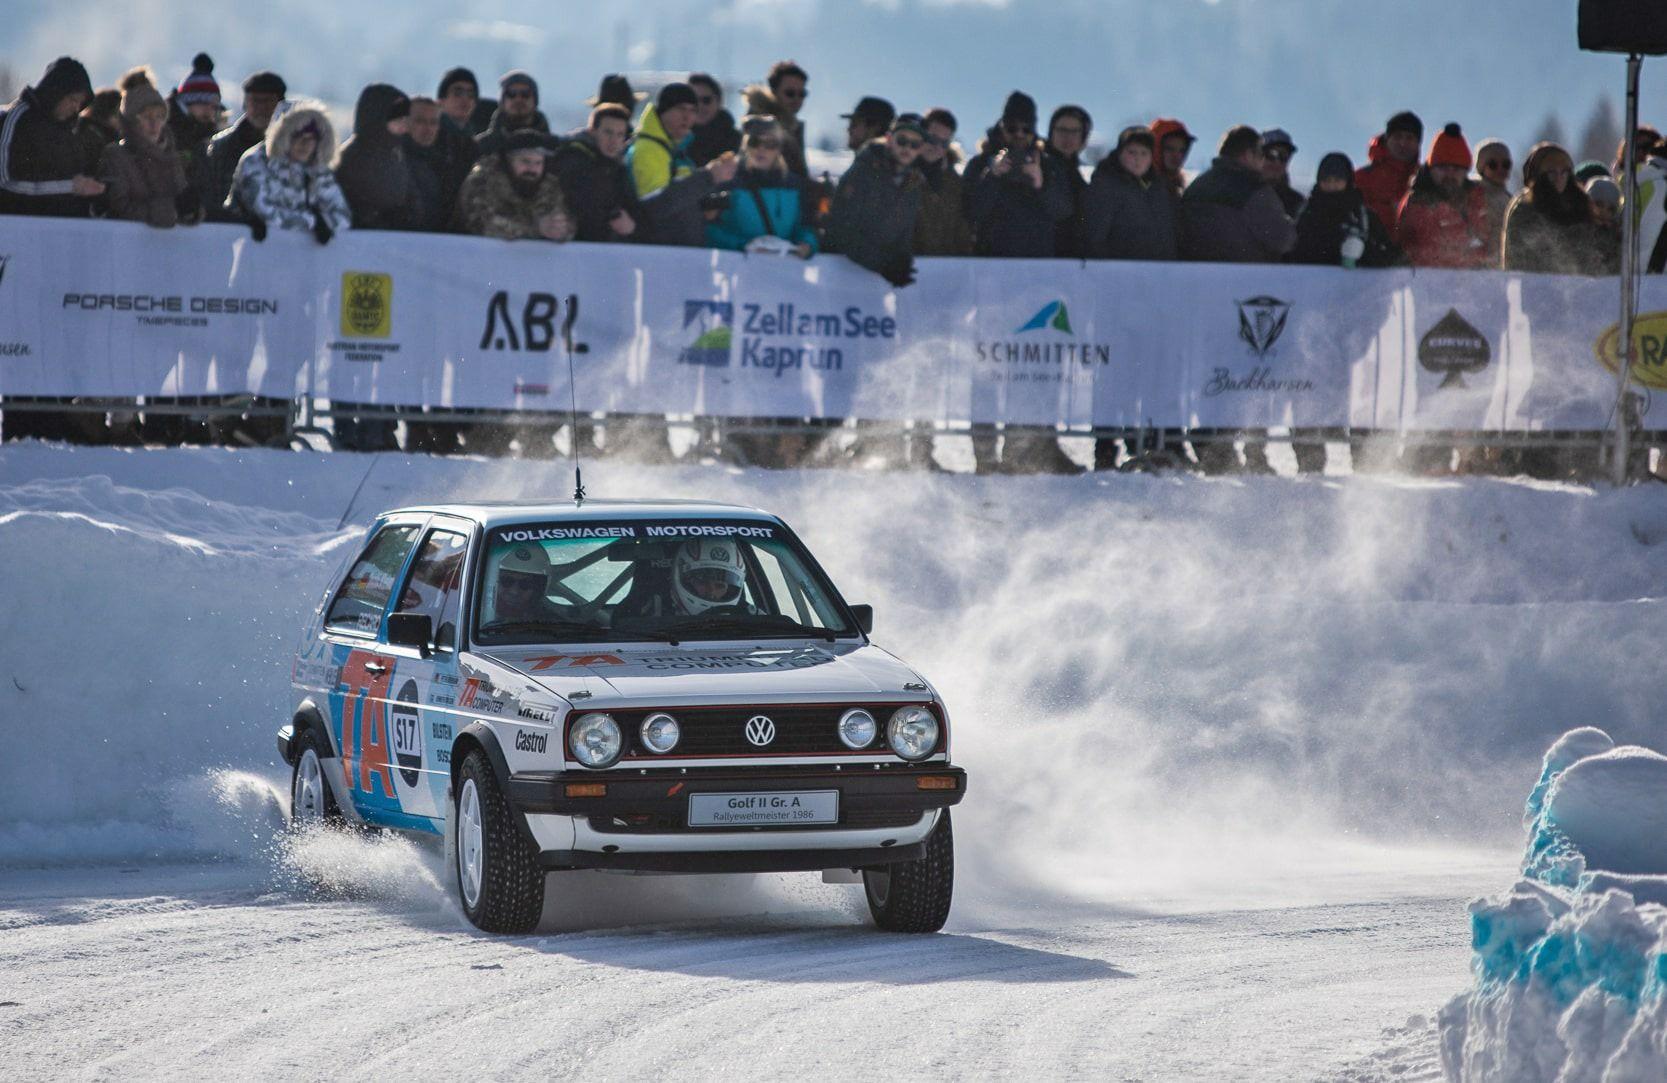 GP Ice race 2020, CHOOOSE, Viessmann